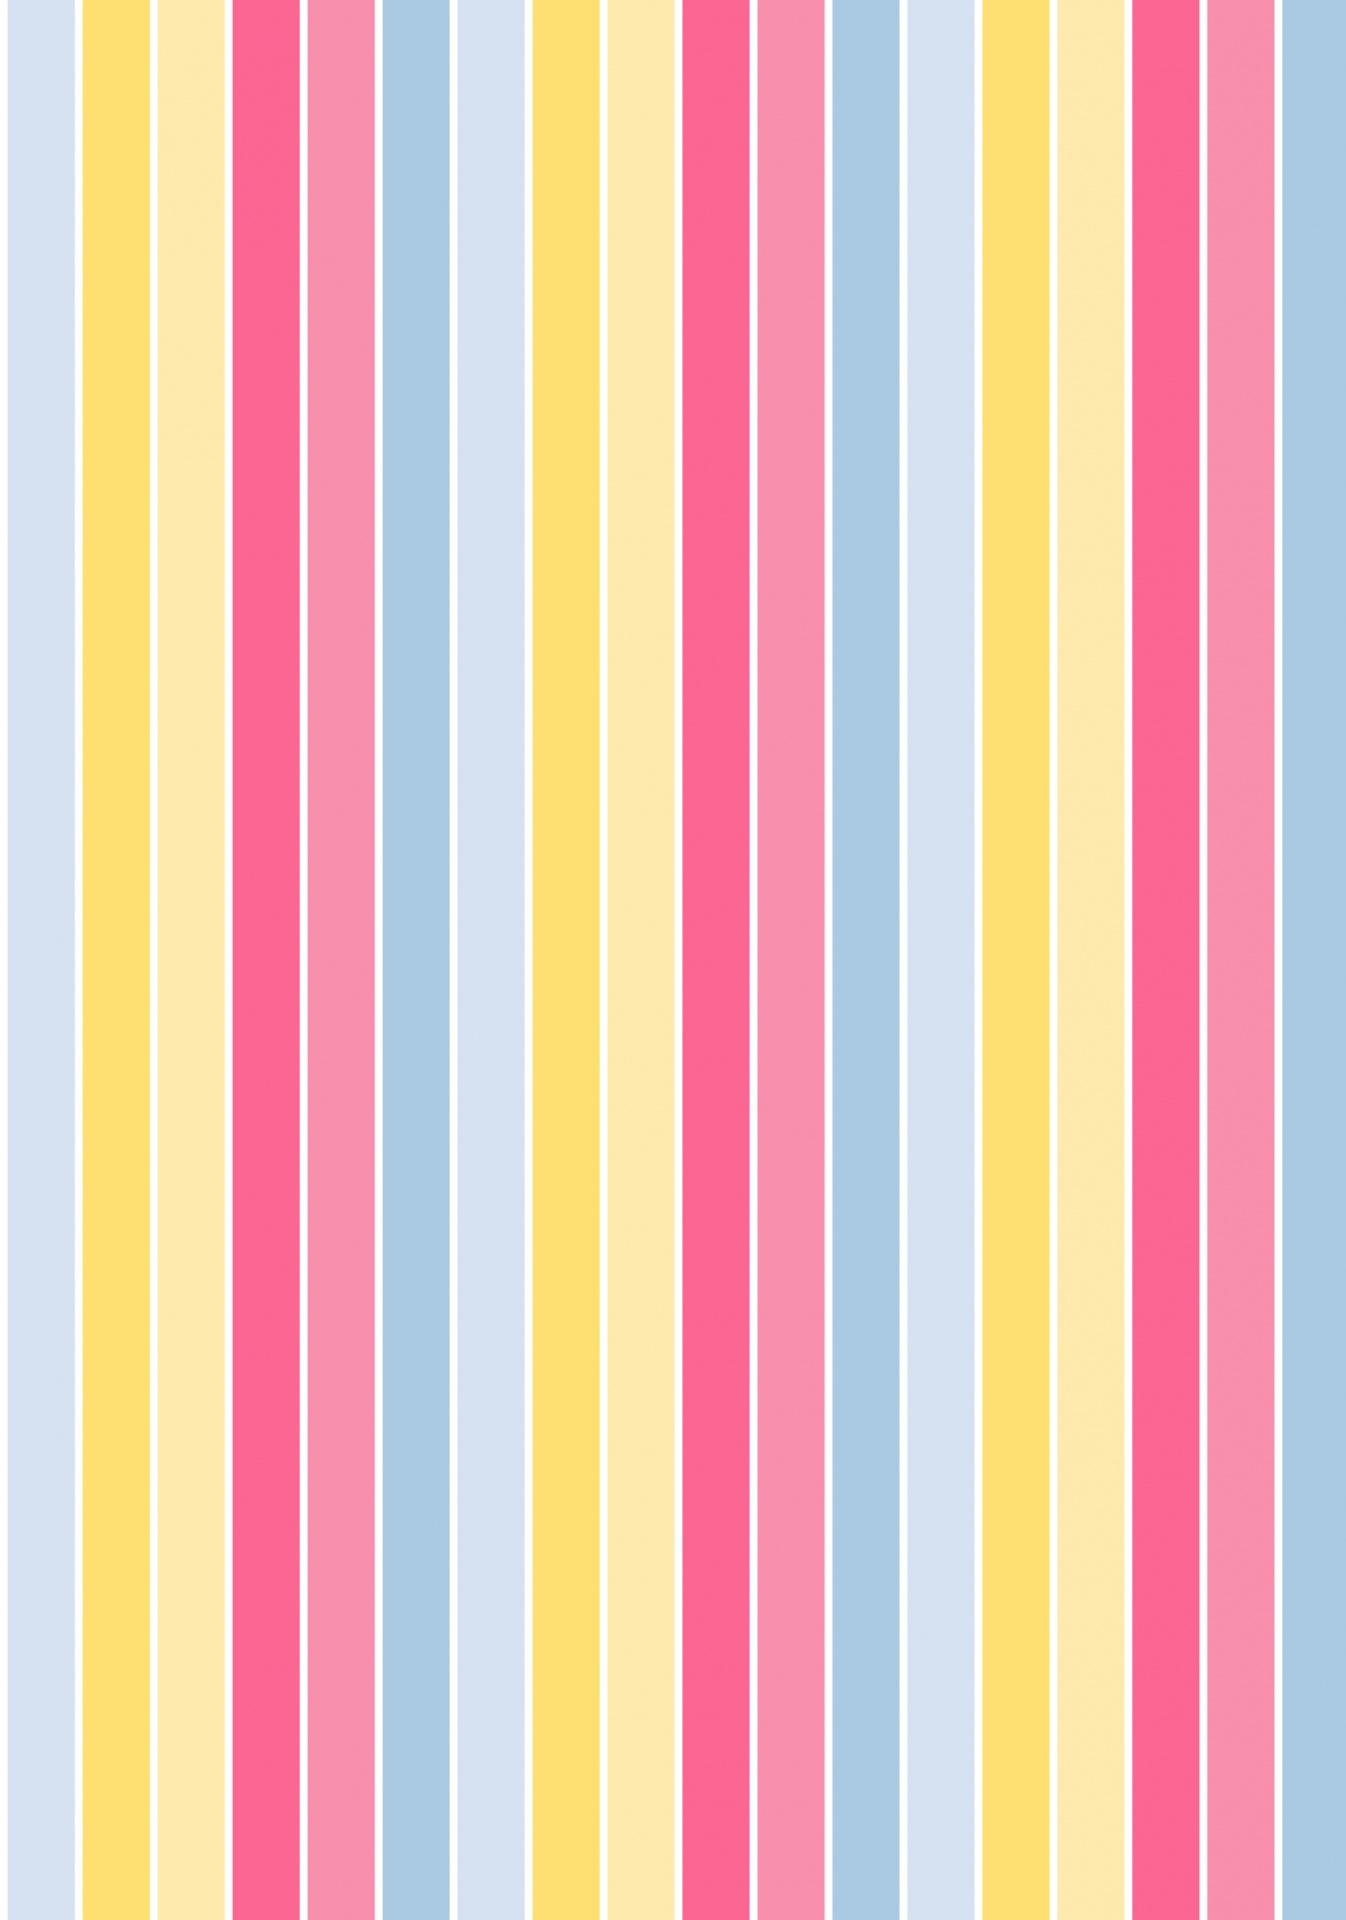 Stripes Striped Wallpaper Paper Background Free Photo